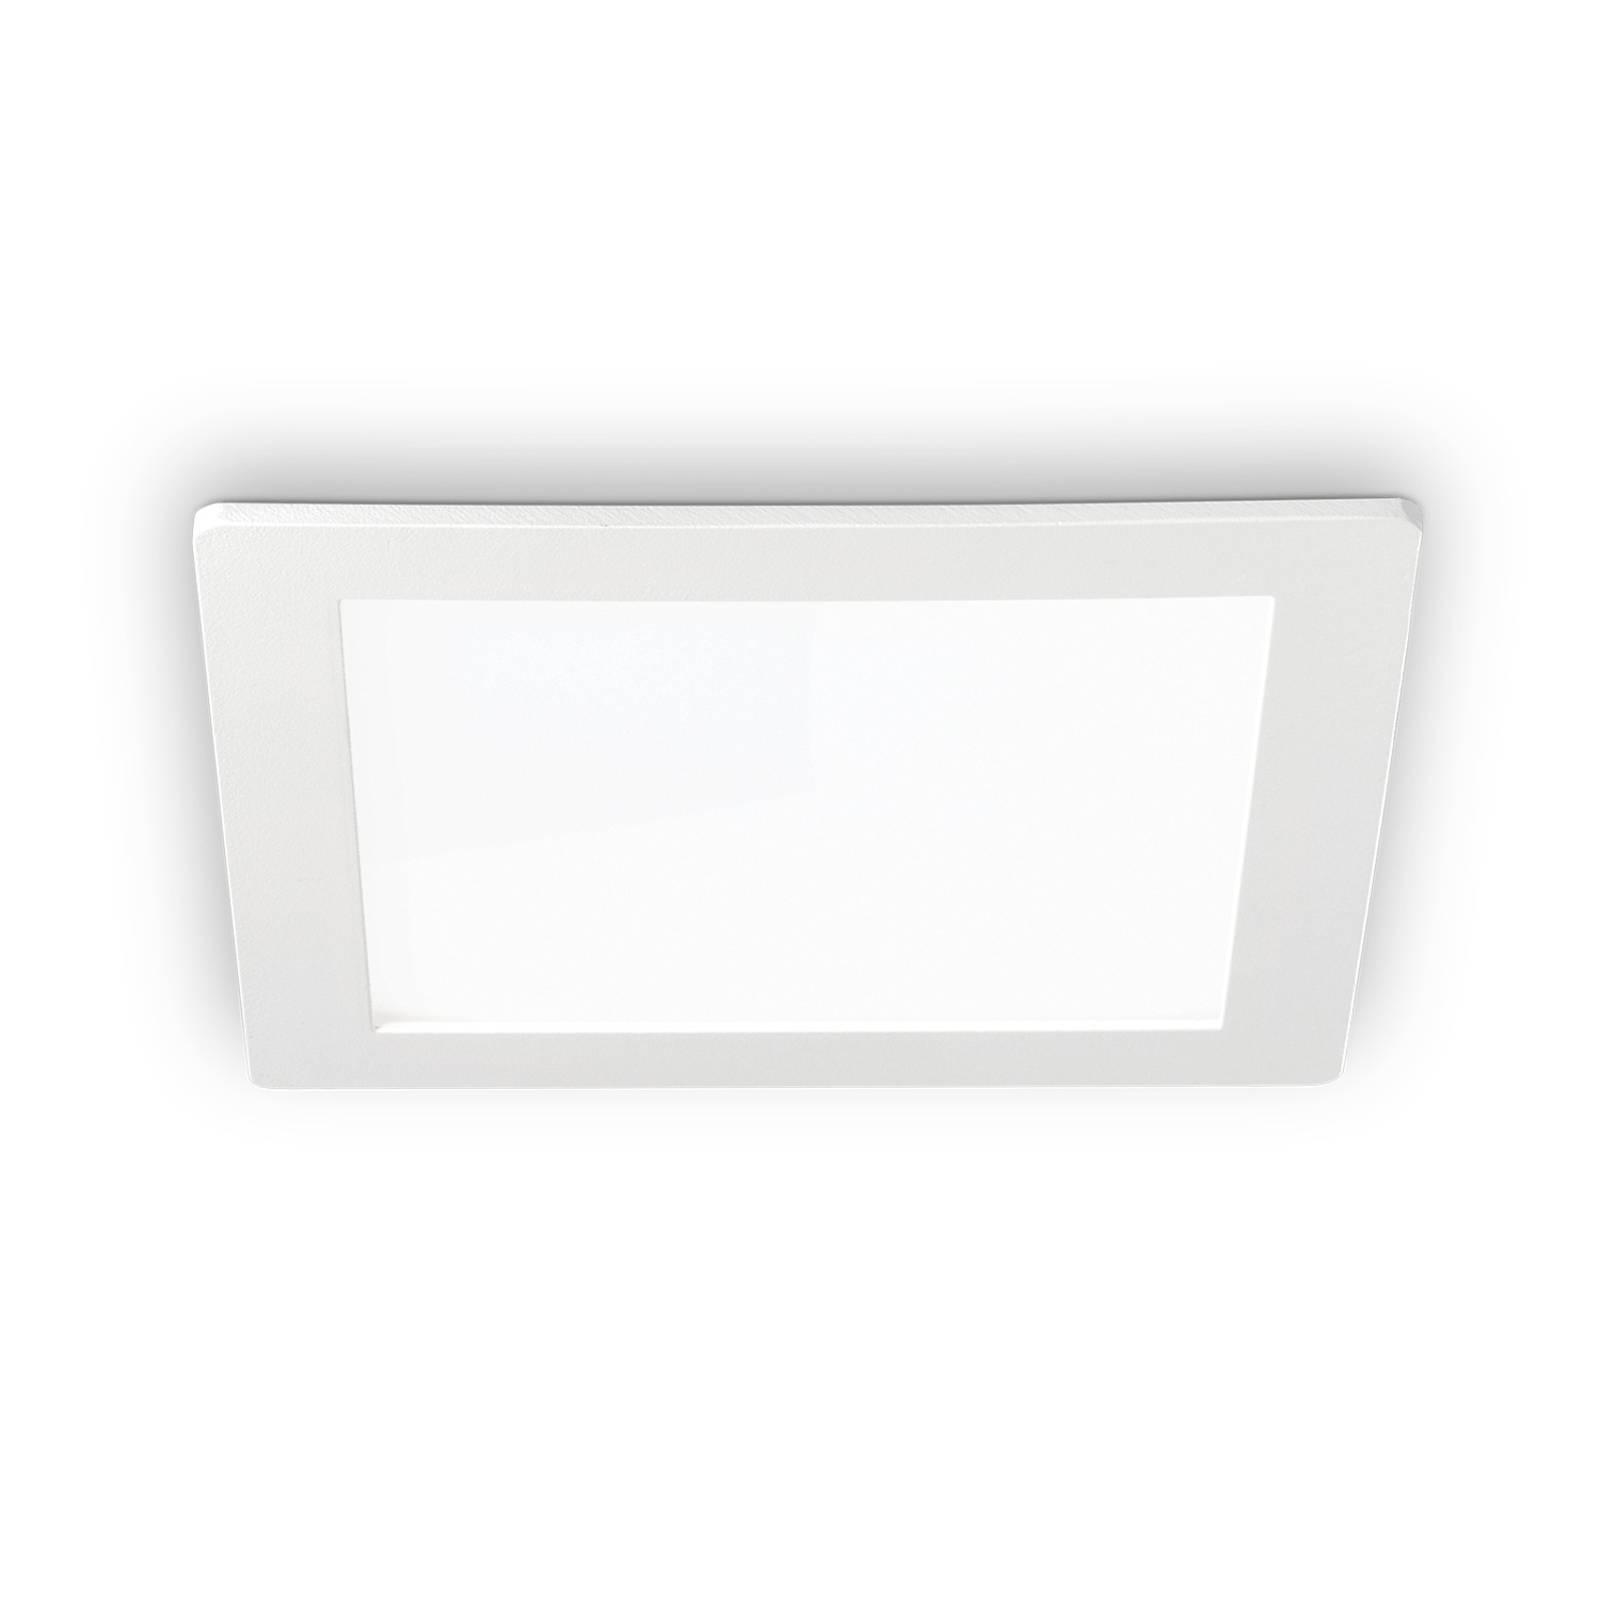 Lampa sufitowa LED Groove square 16,8x16,8 cm